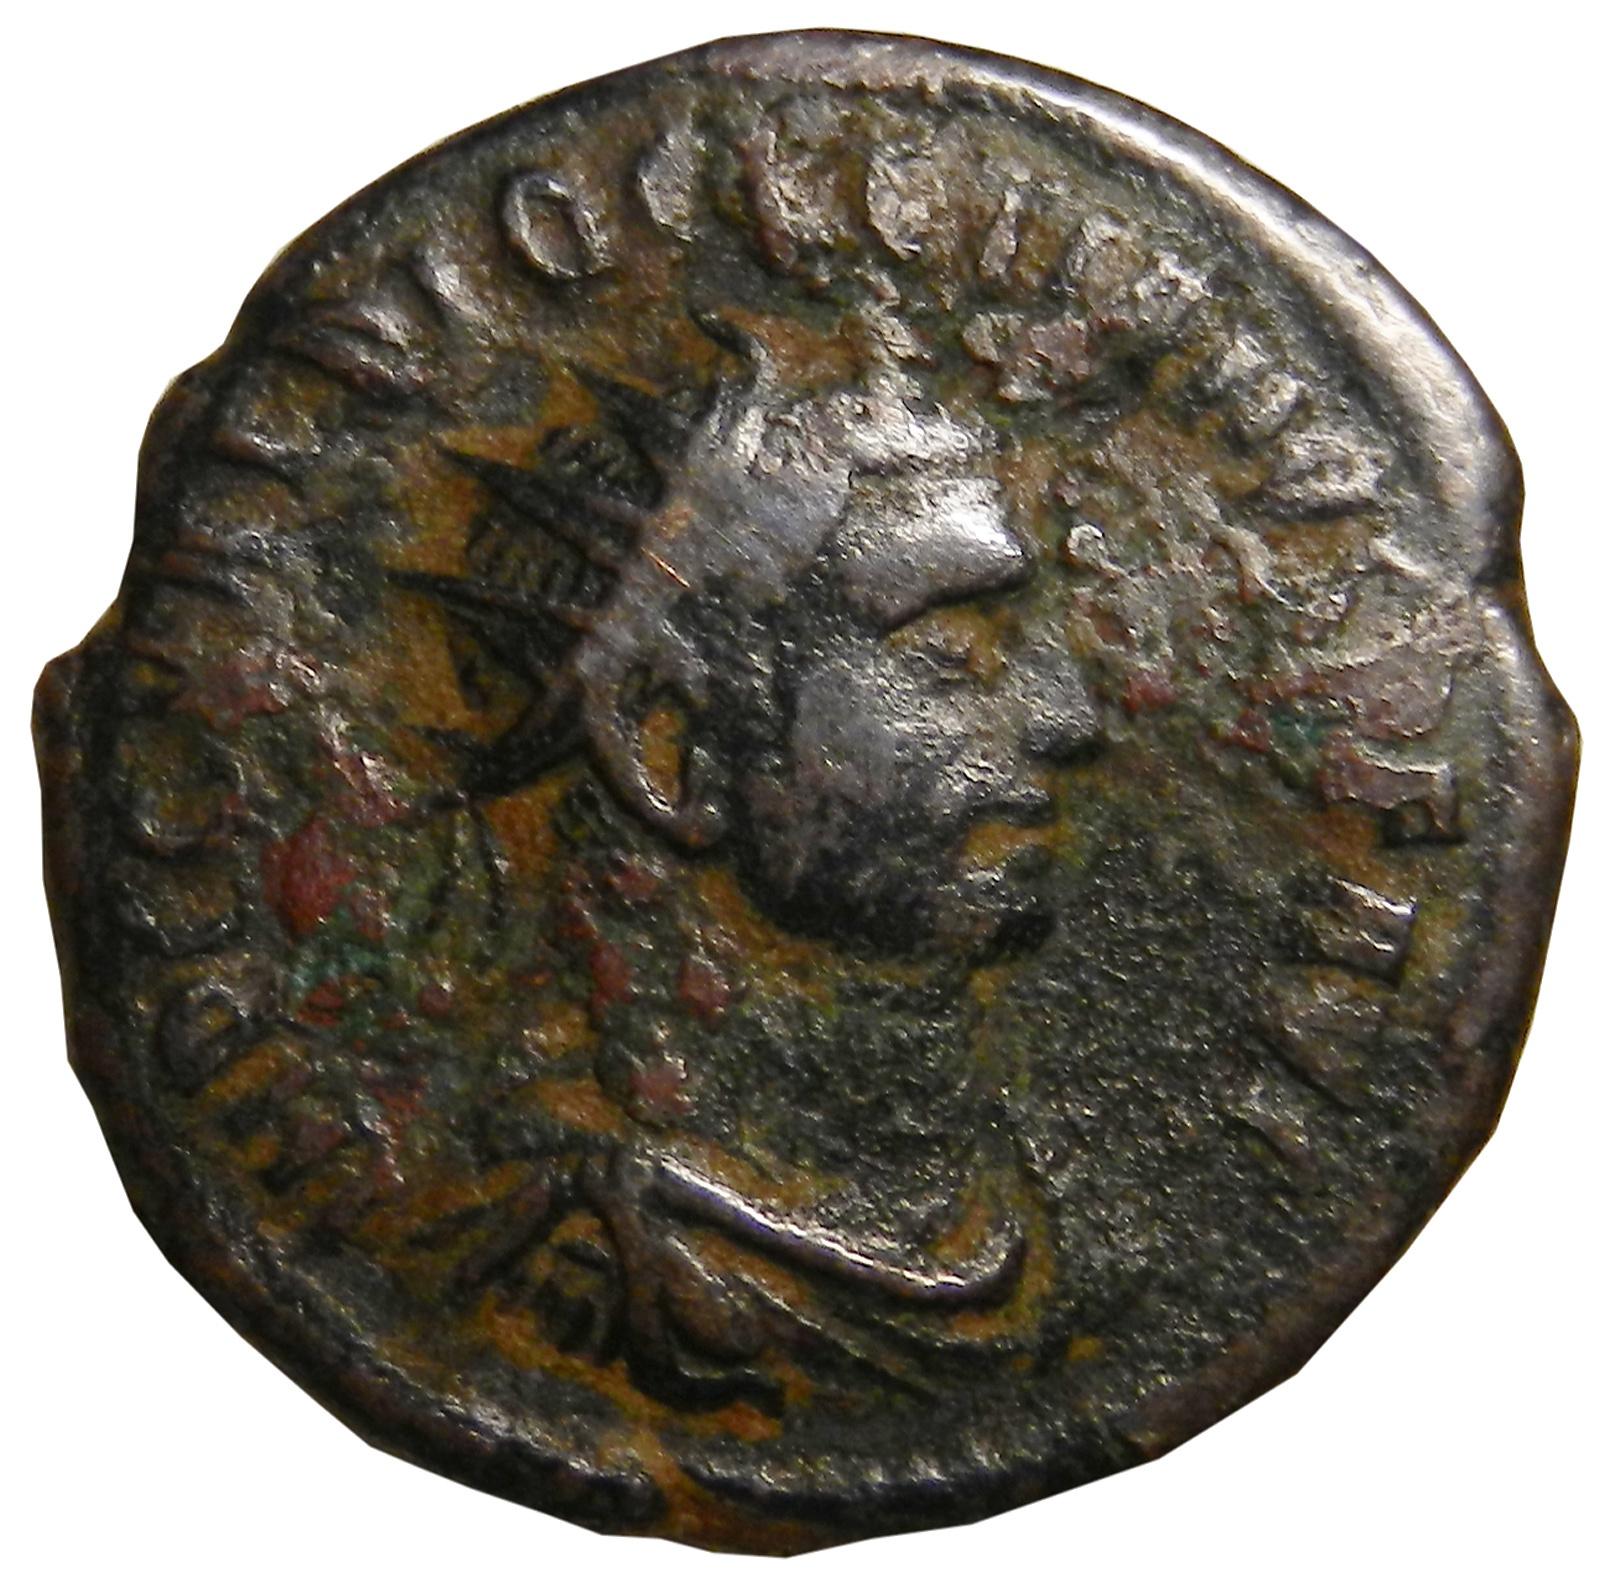 Монета антониниан. Диоклетиан. Бронза. Древний Рим, 285-290 гг. (Юпитер)